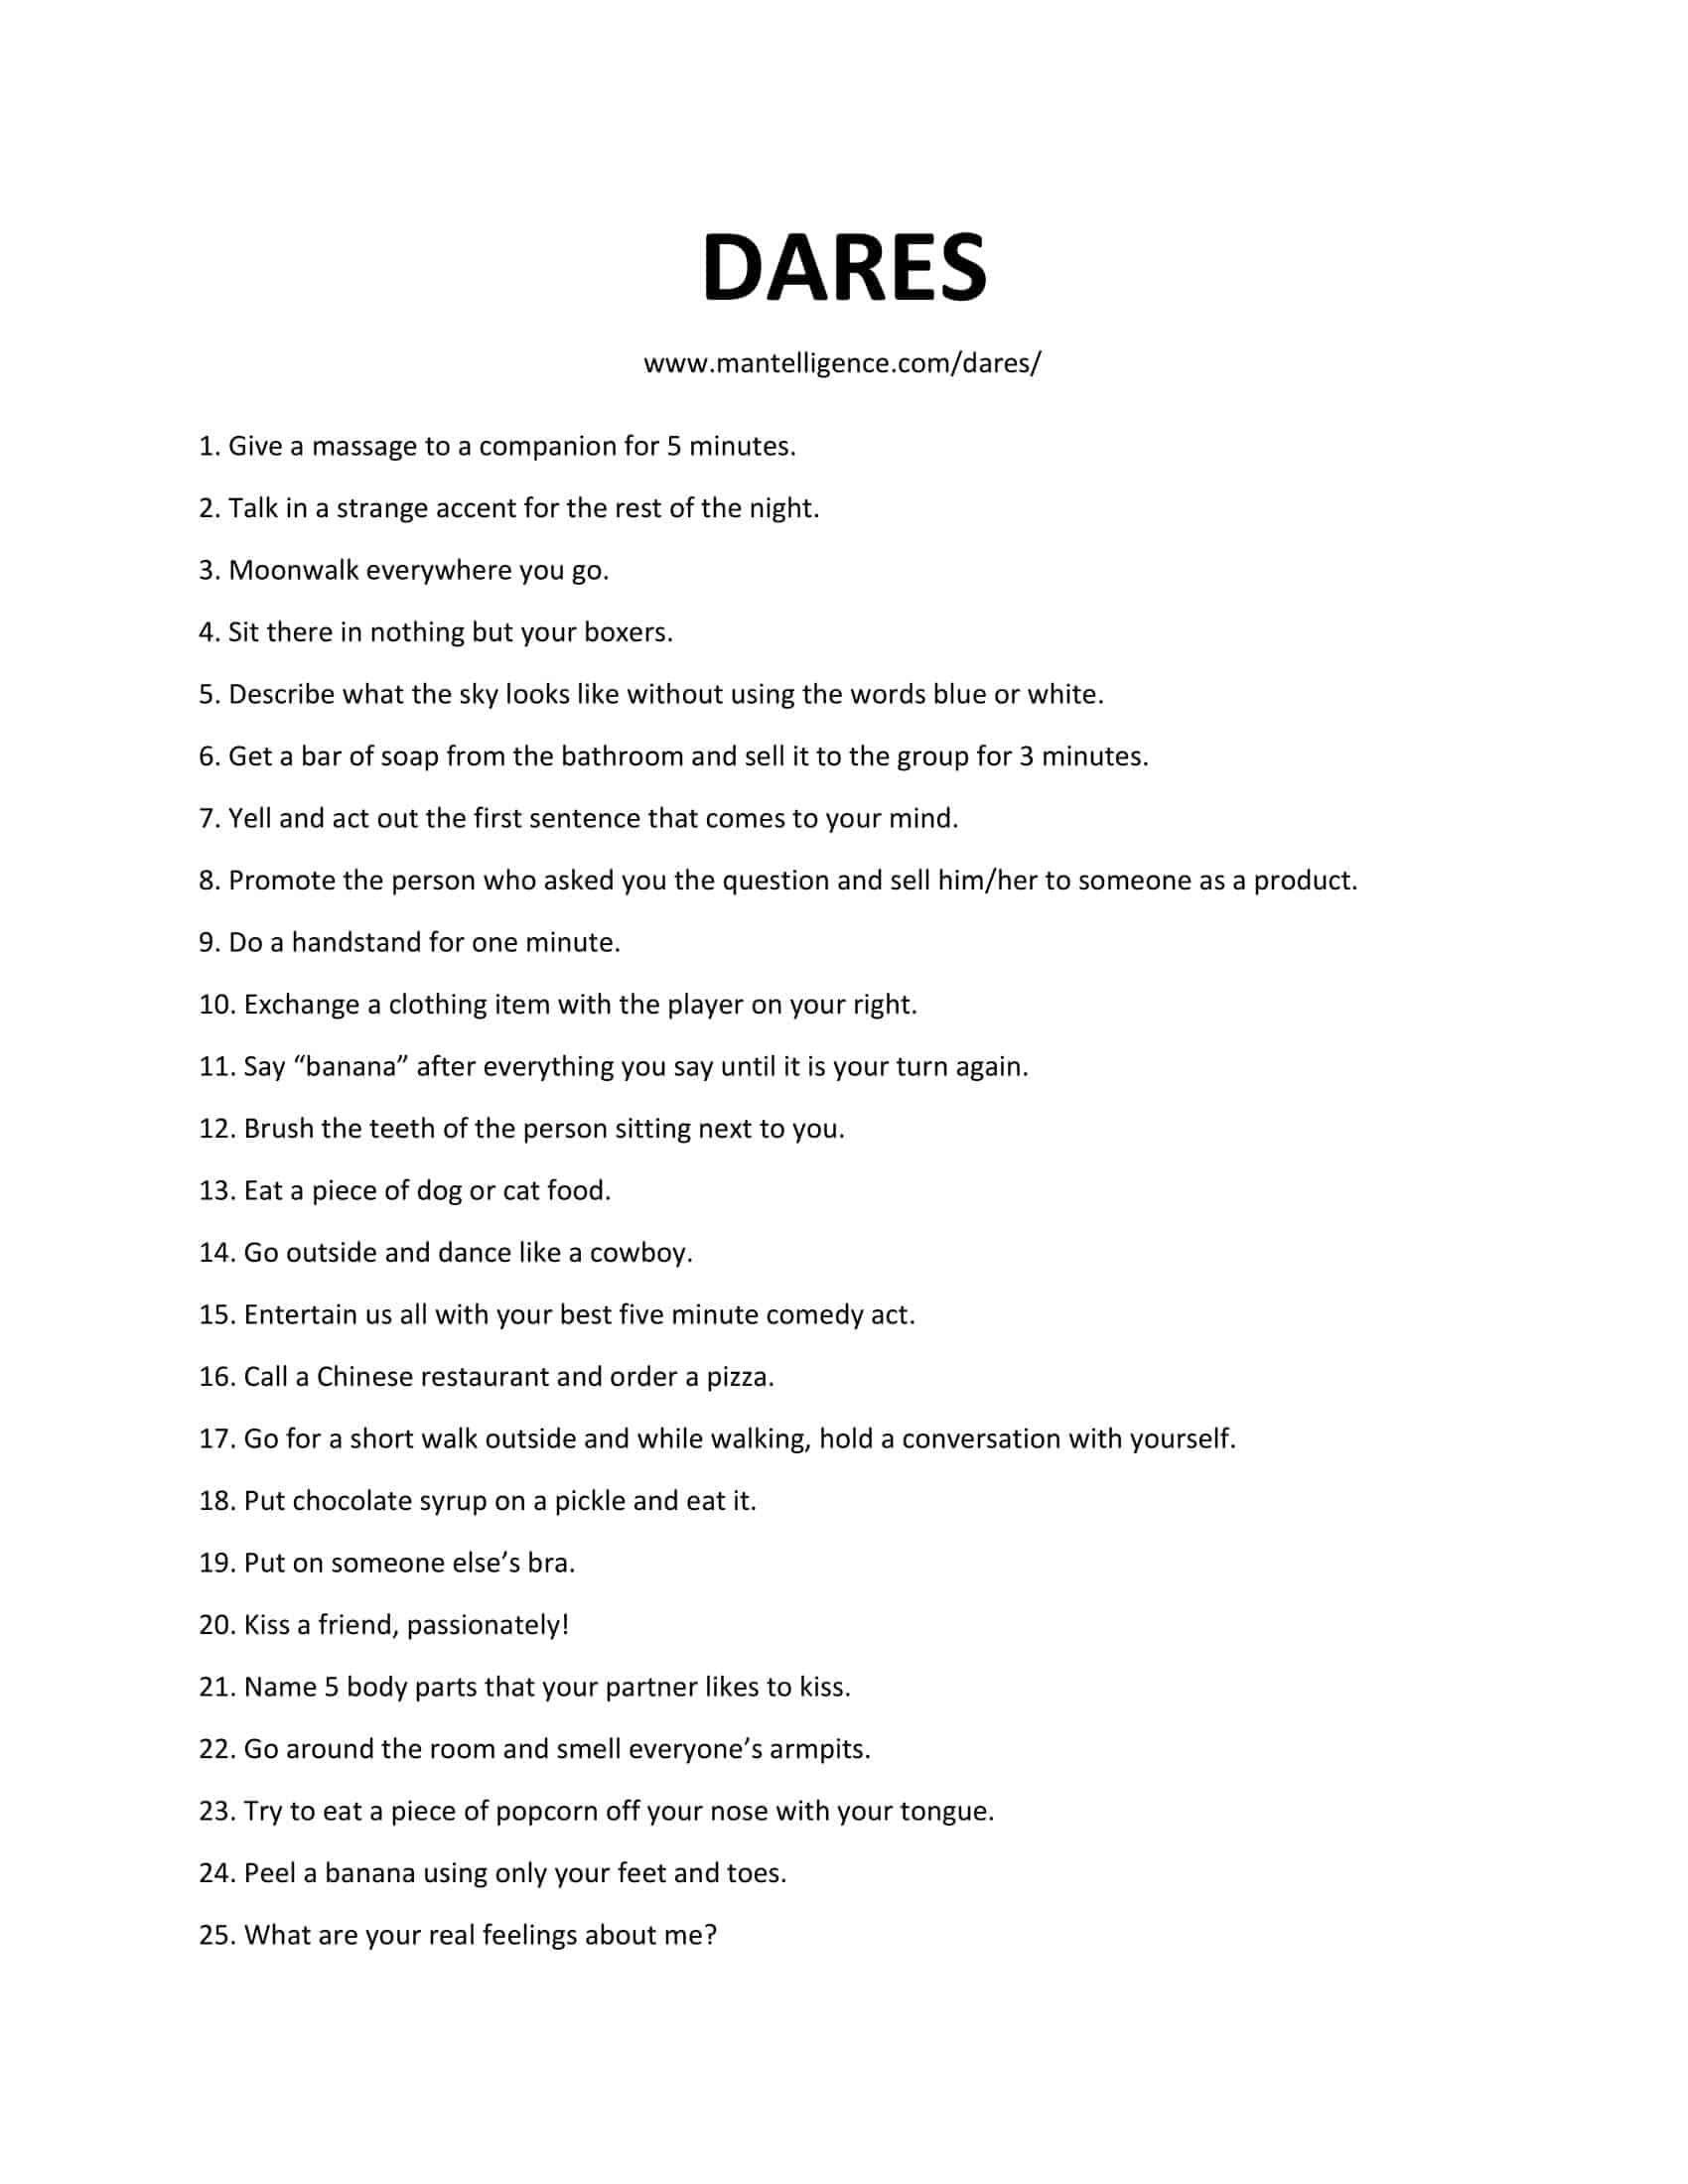 List of sex dares